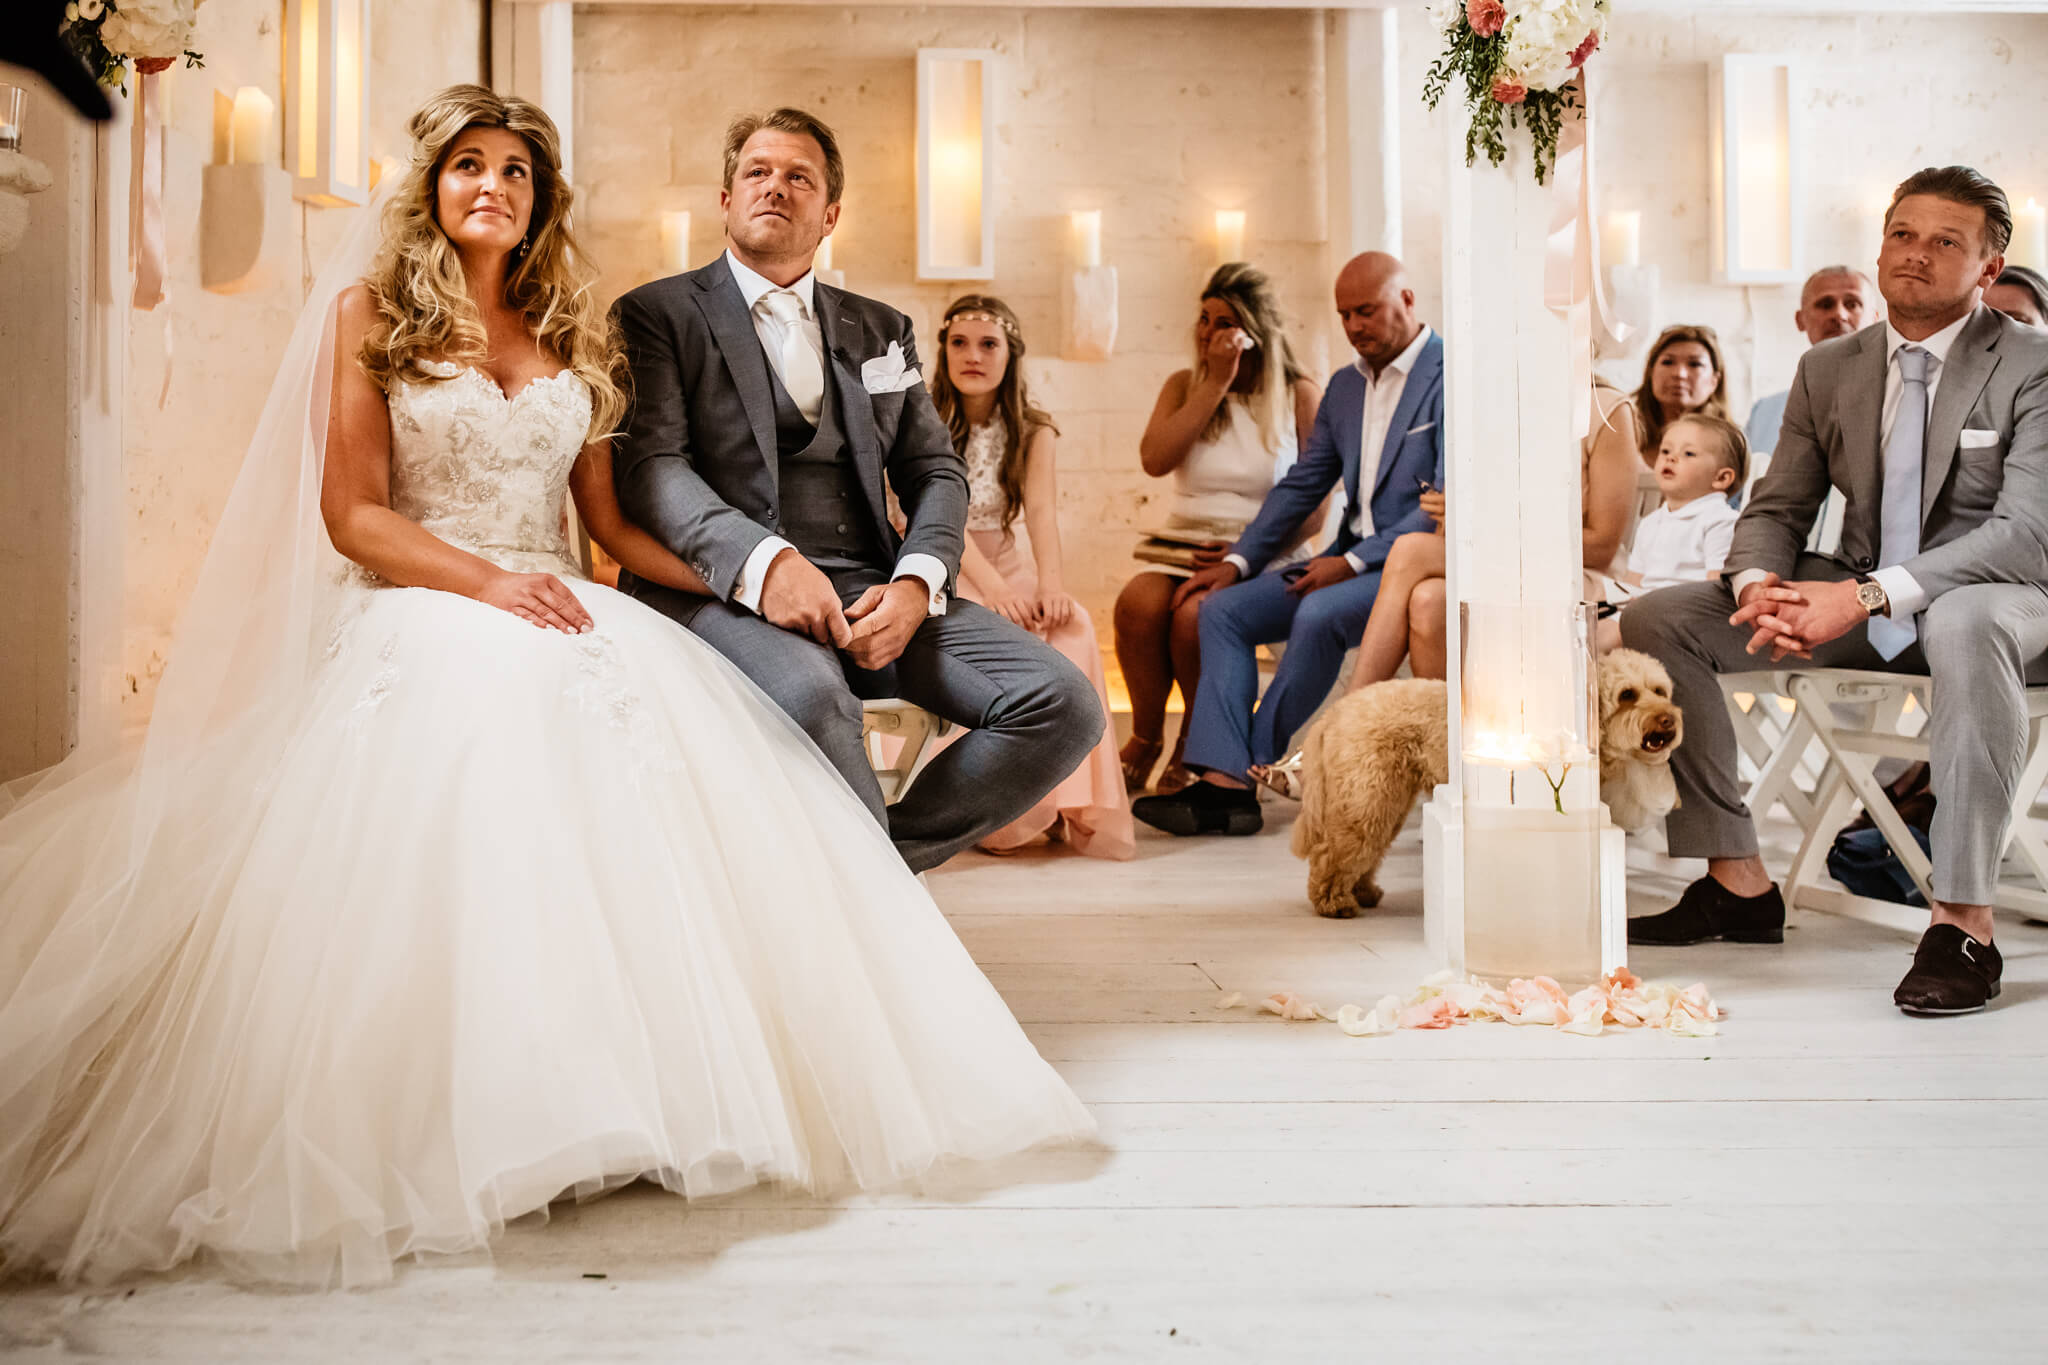 destination-wedding-italy-puglia-20.jpg